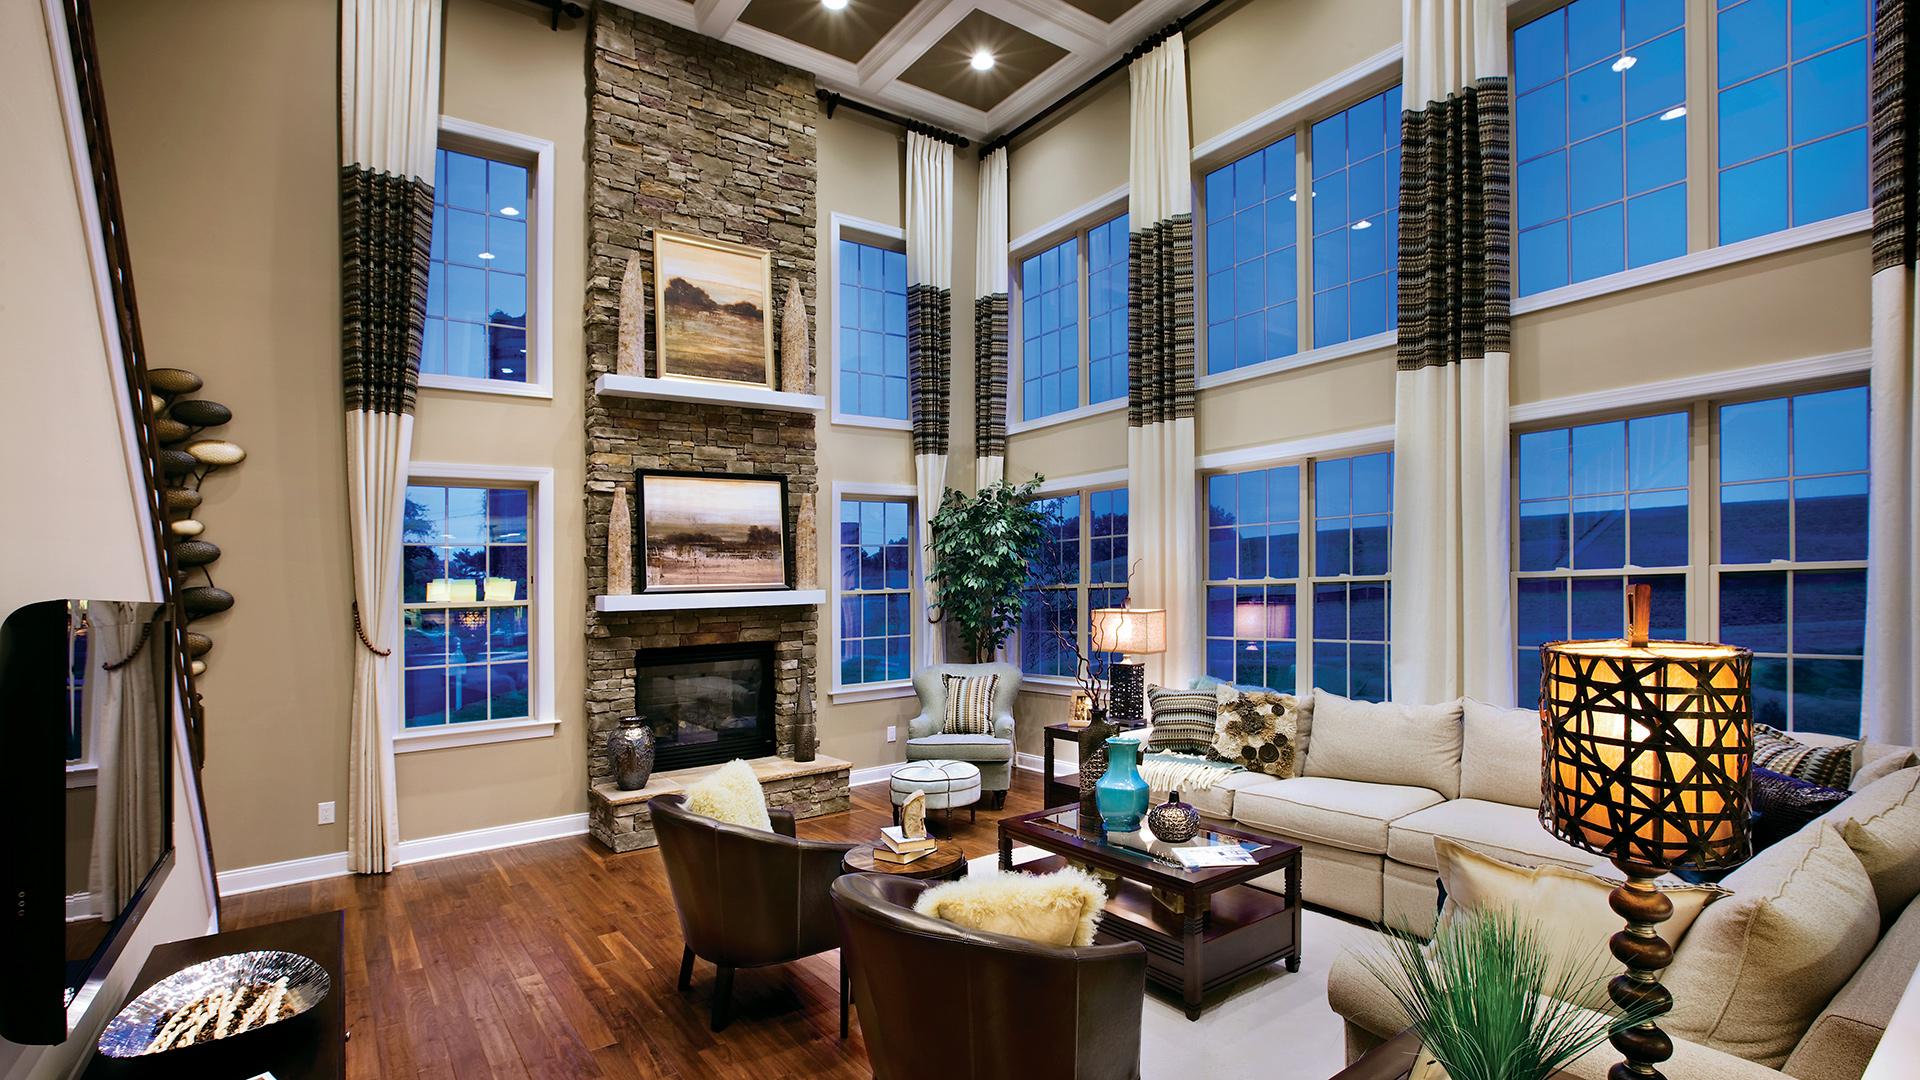 Upper Marlboro Md New Homes For Sale Marlboro Ridge The Hunt